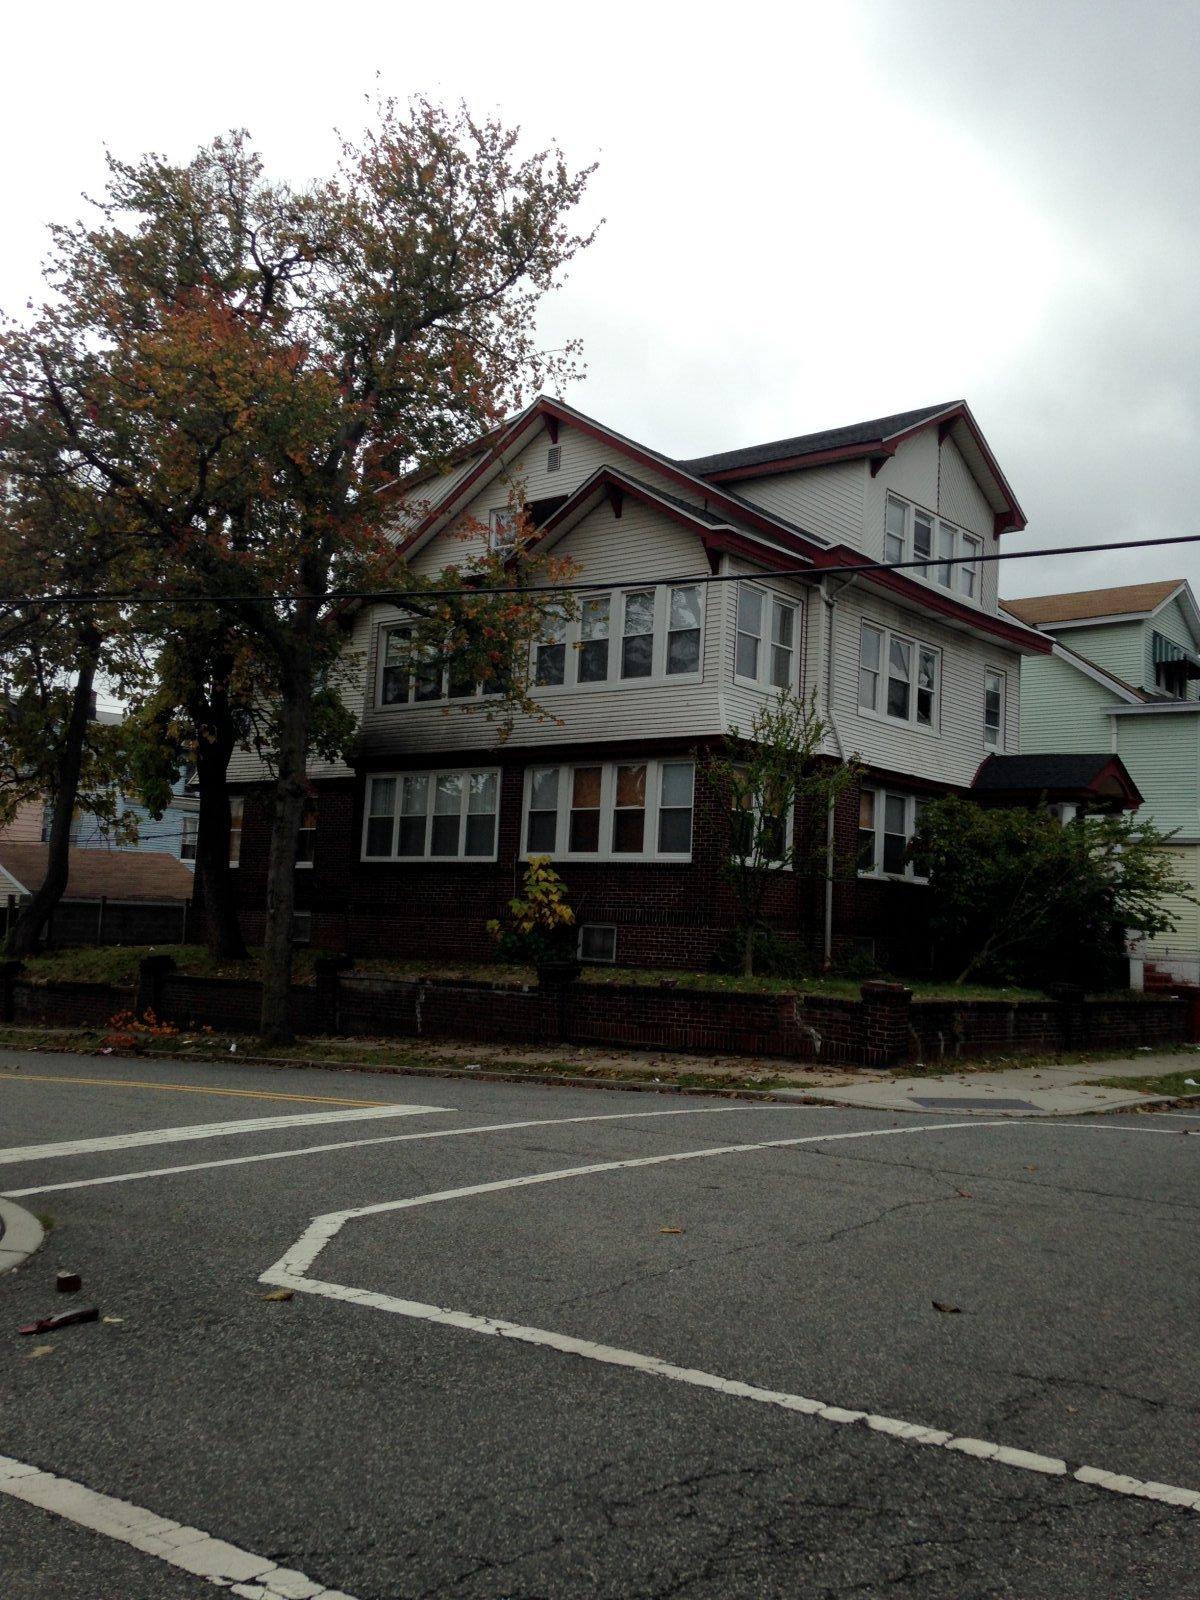 Understanding the Foreclosure Process in Newark, New Jersey